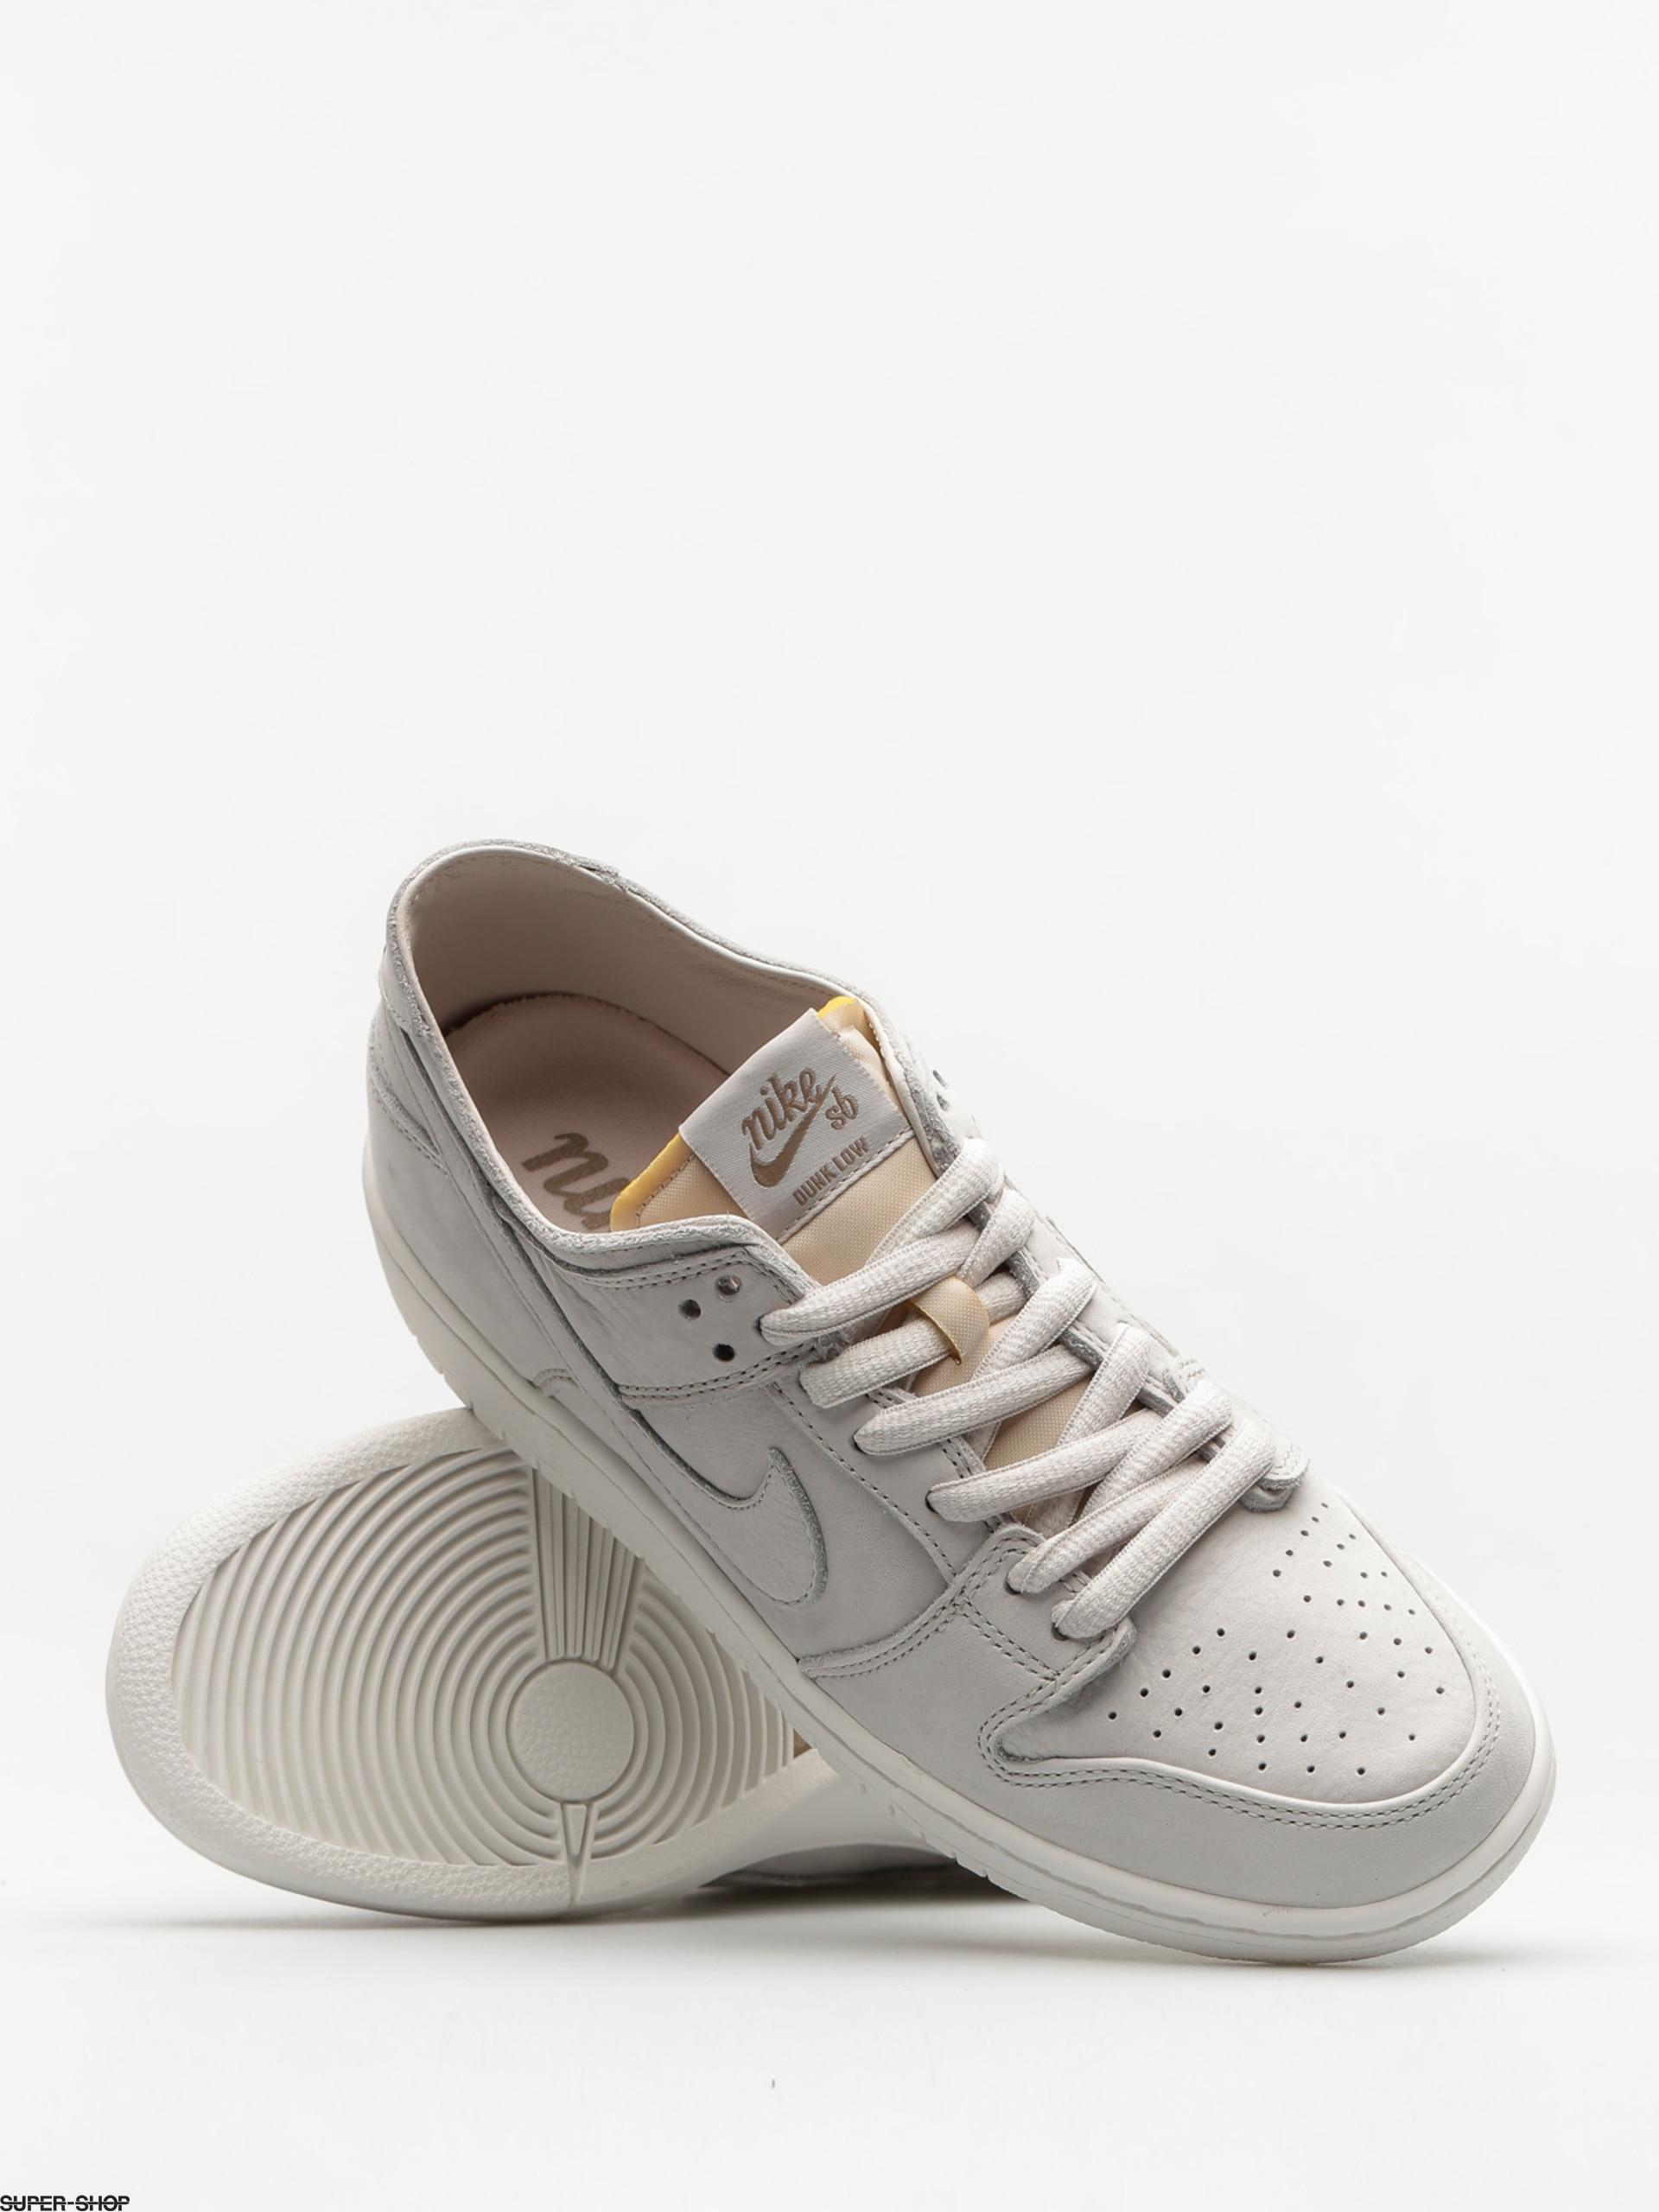 63a429bdc81a Nike SB Shoes Zoom Dunk Low Pro Deconstructed (light bone light bone summit  white khaki)